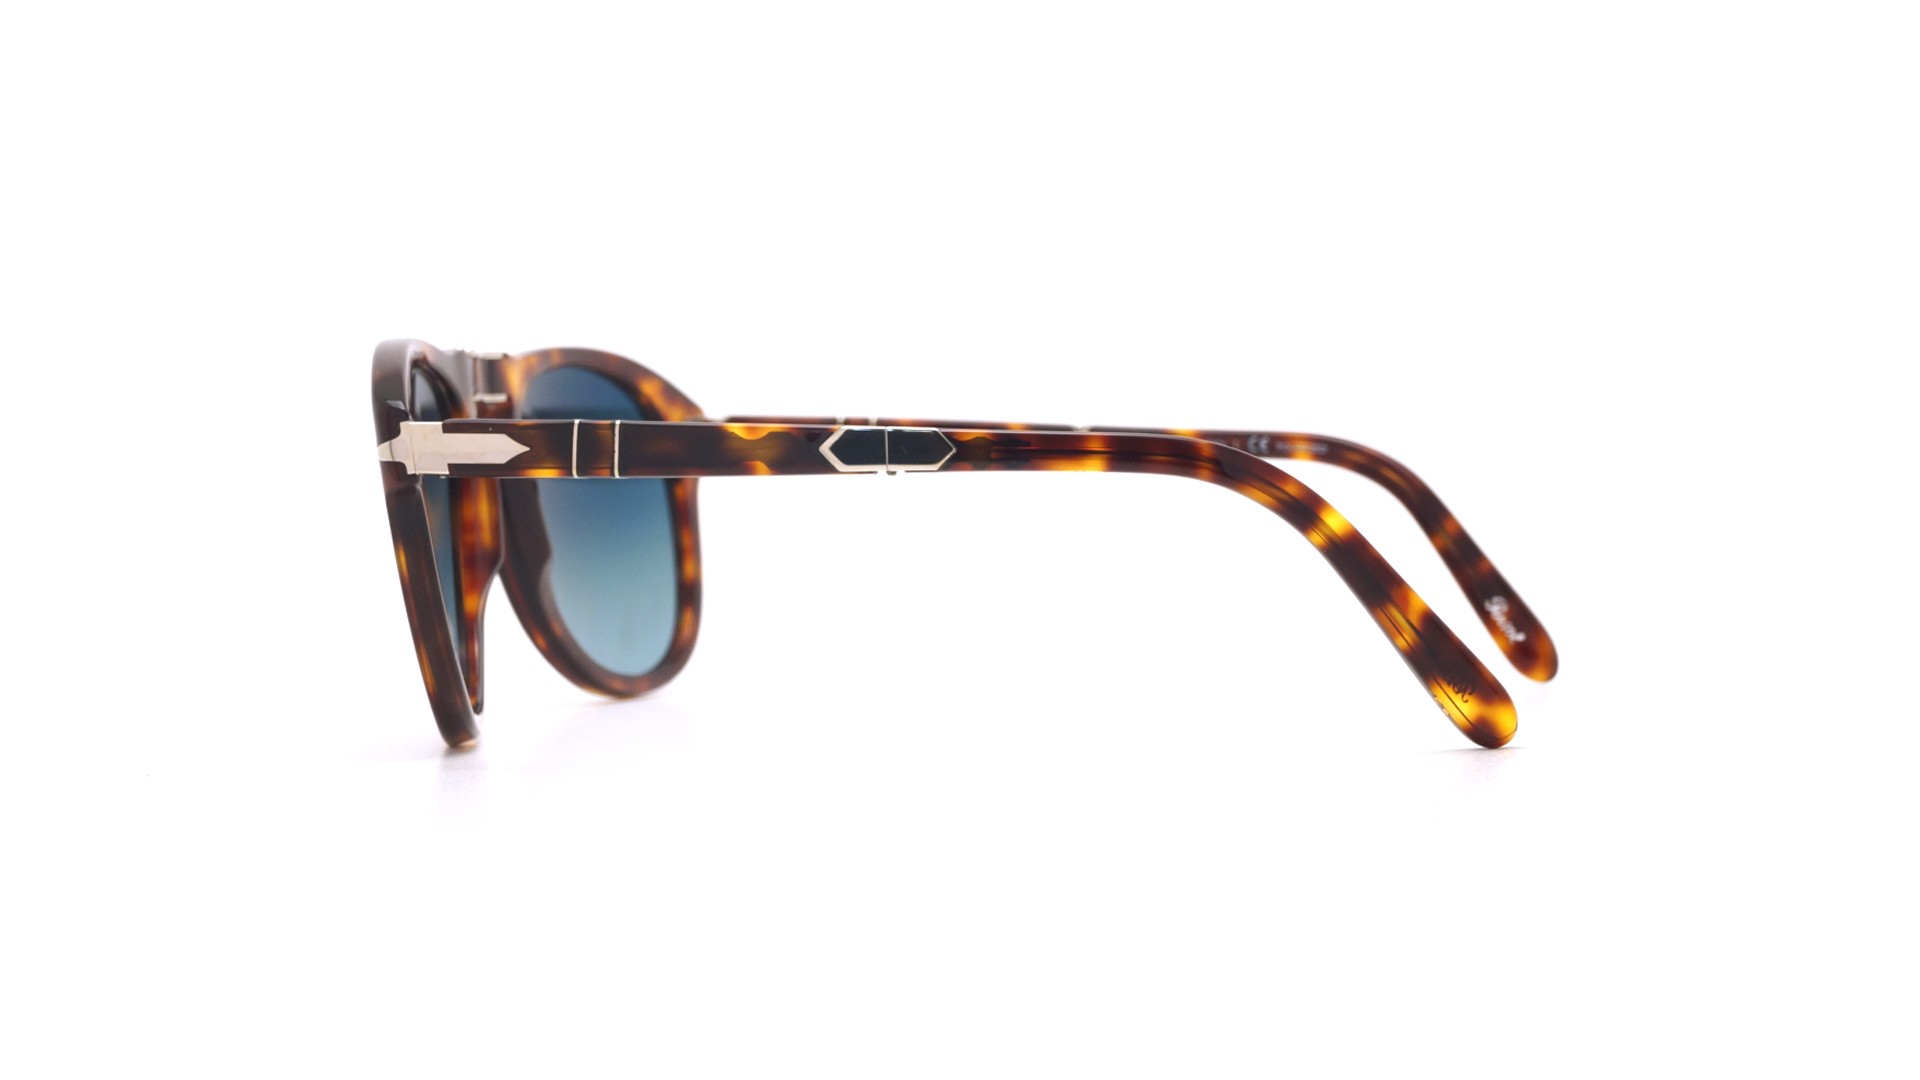 2431f206c62b Sunglasses Persol Steve Mcqueen Tortoise PO0714SM 24/S3 54-21 Folding  Polarized